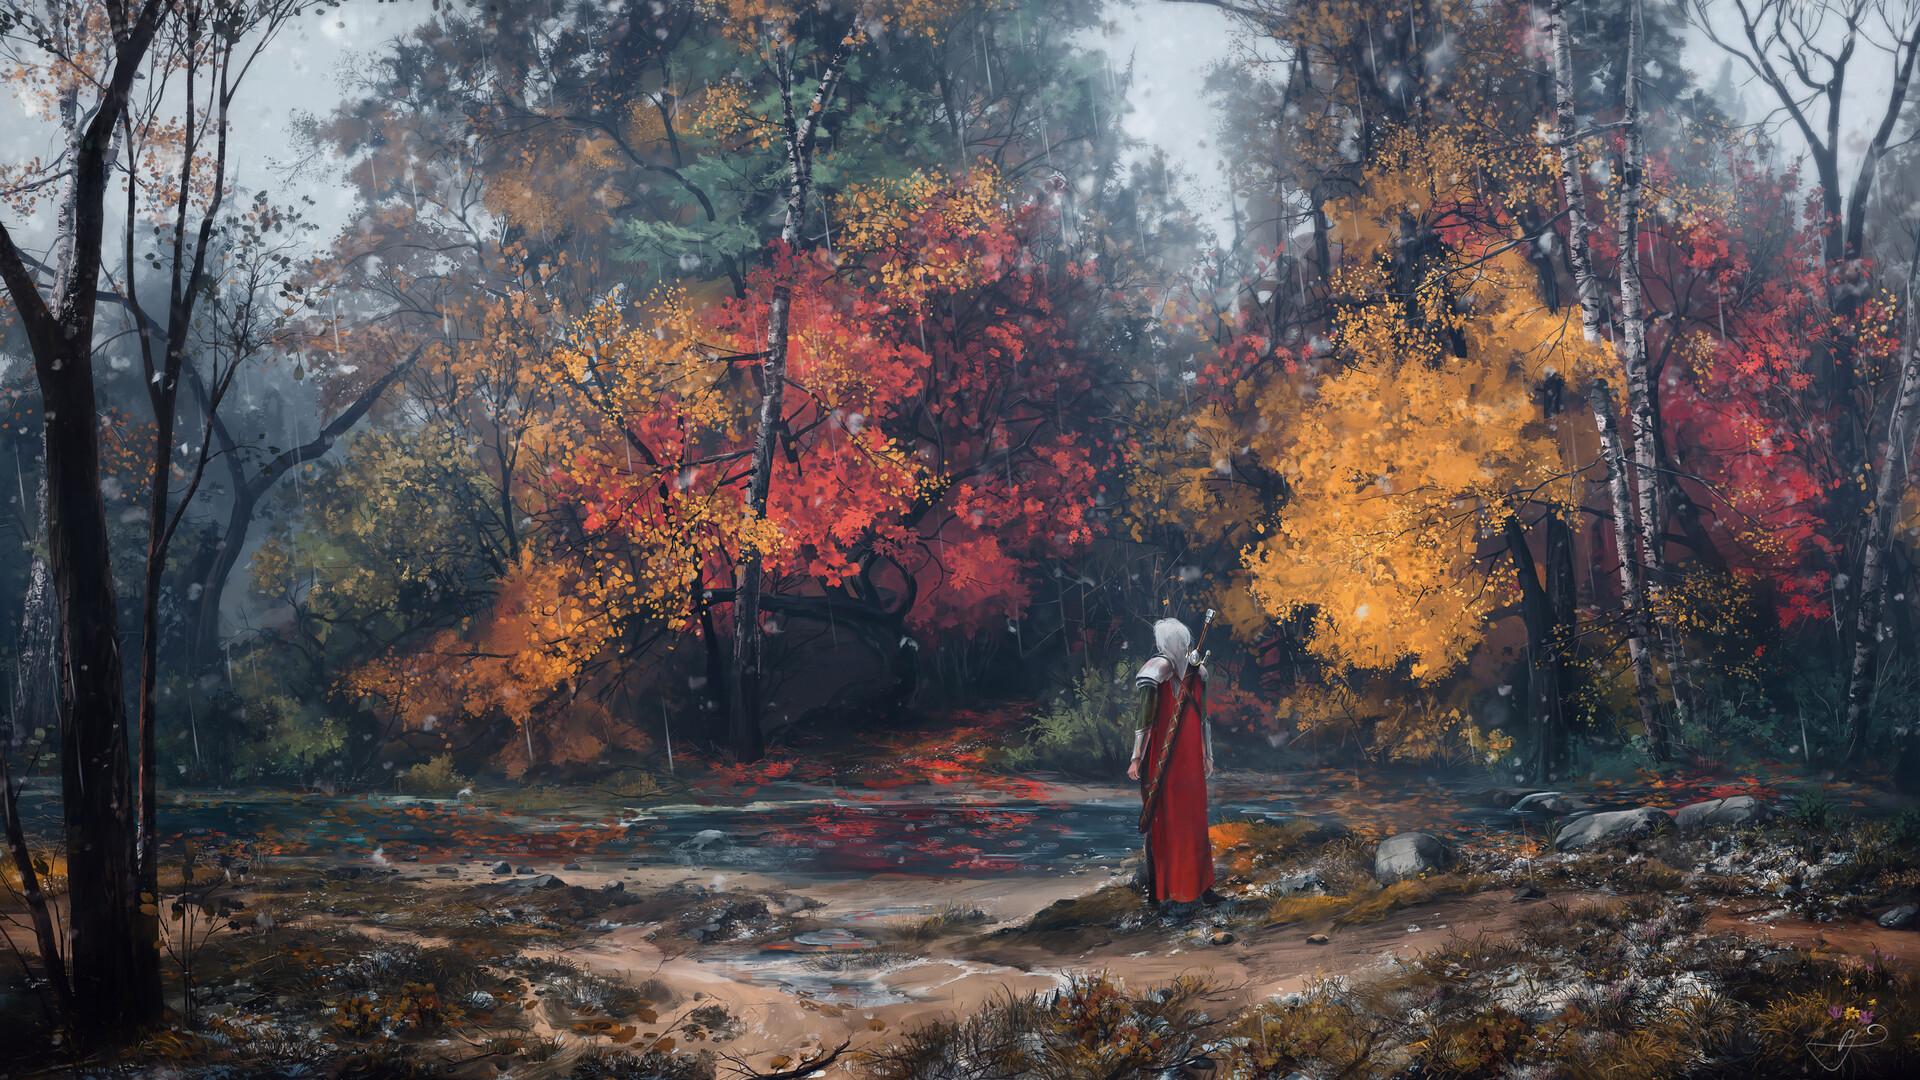 General 1920x1080 Max Suleimanov digital art landscape river lake fall trees